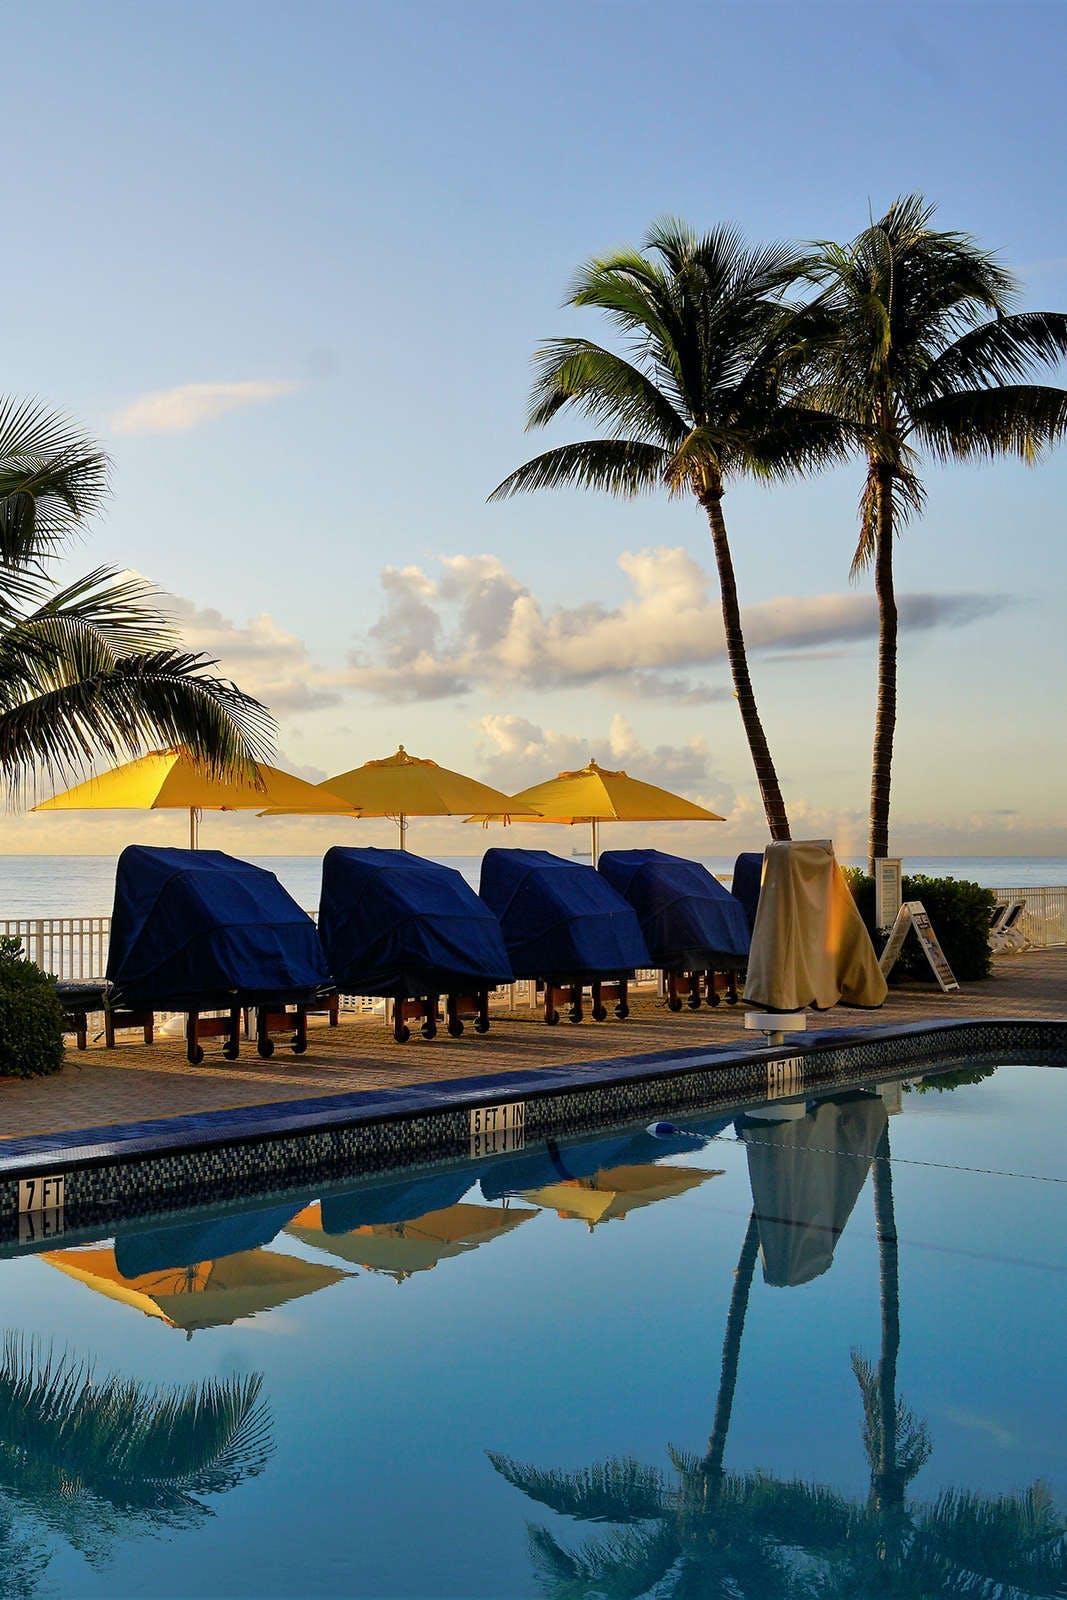 Ocean Sky Hotel & Resort